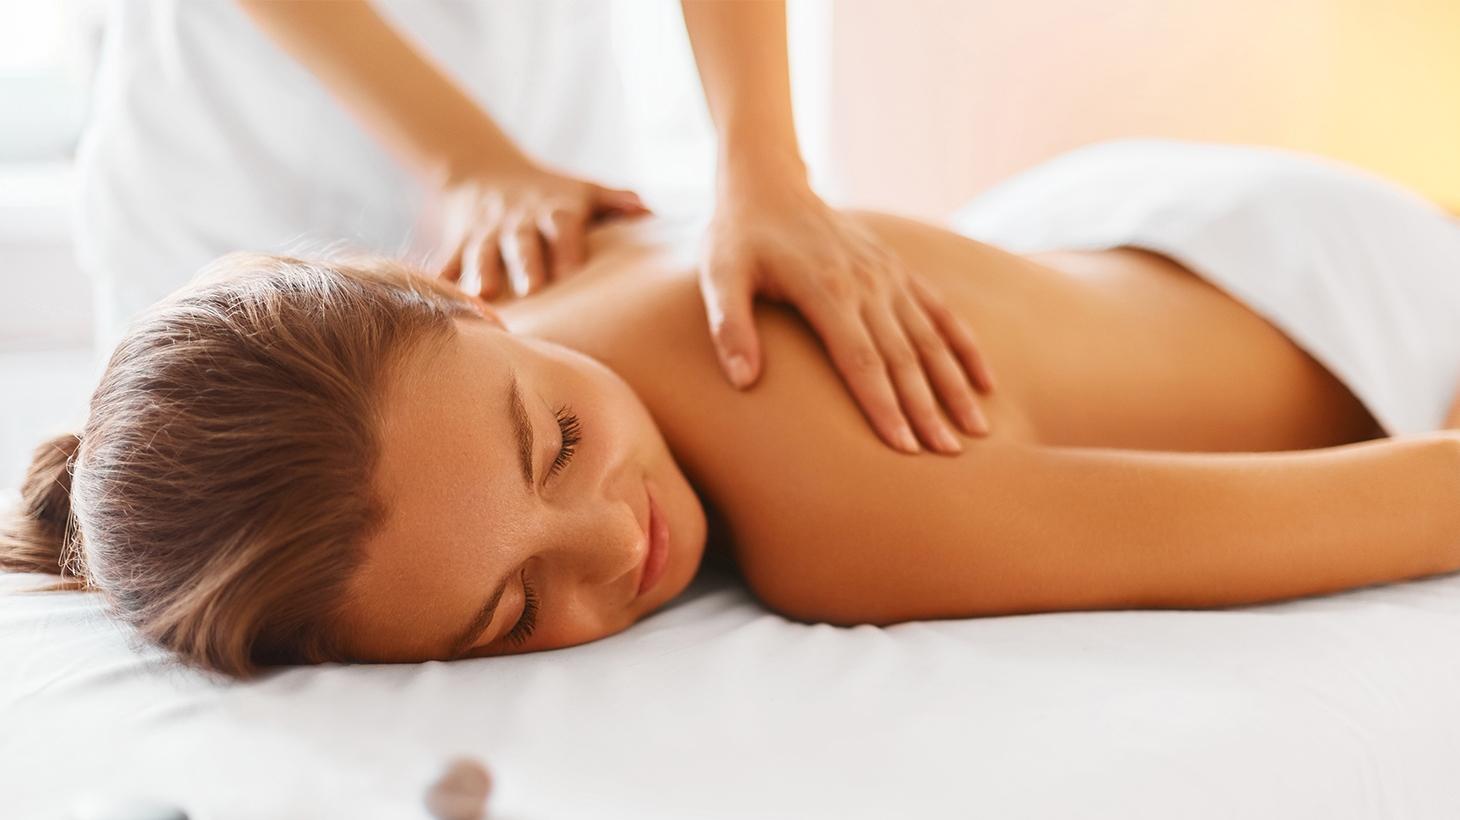 Woman having a relaxing back massage